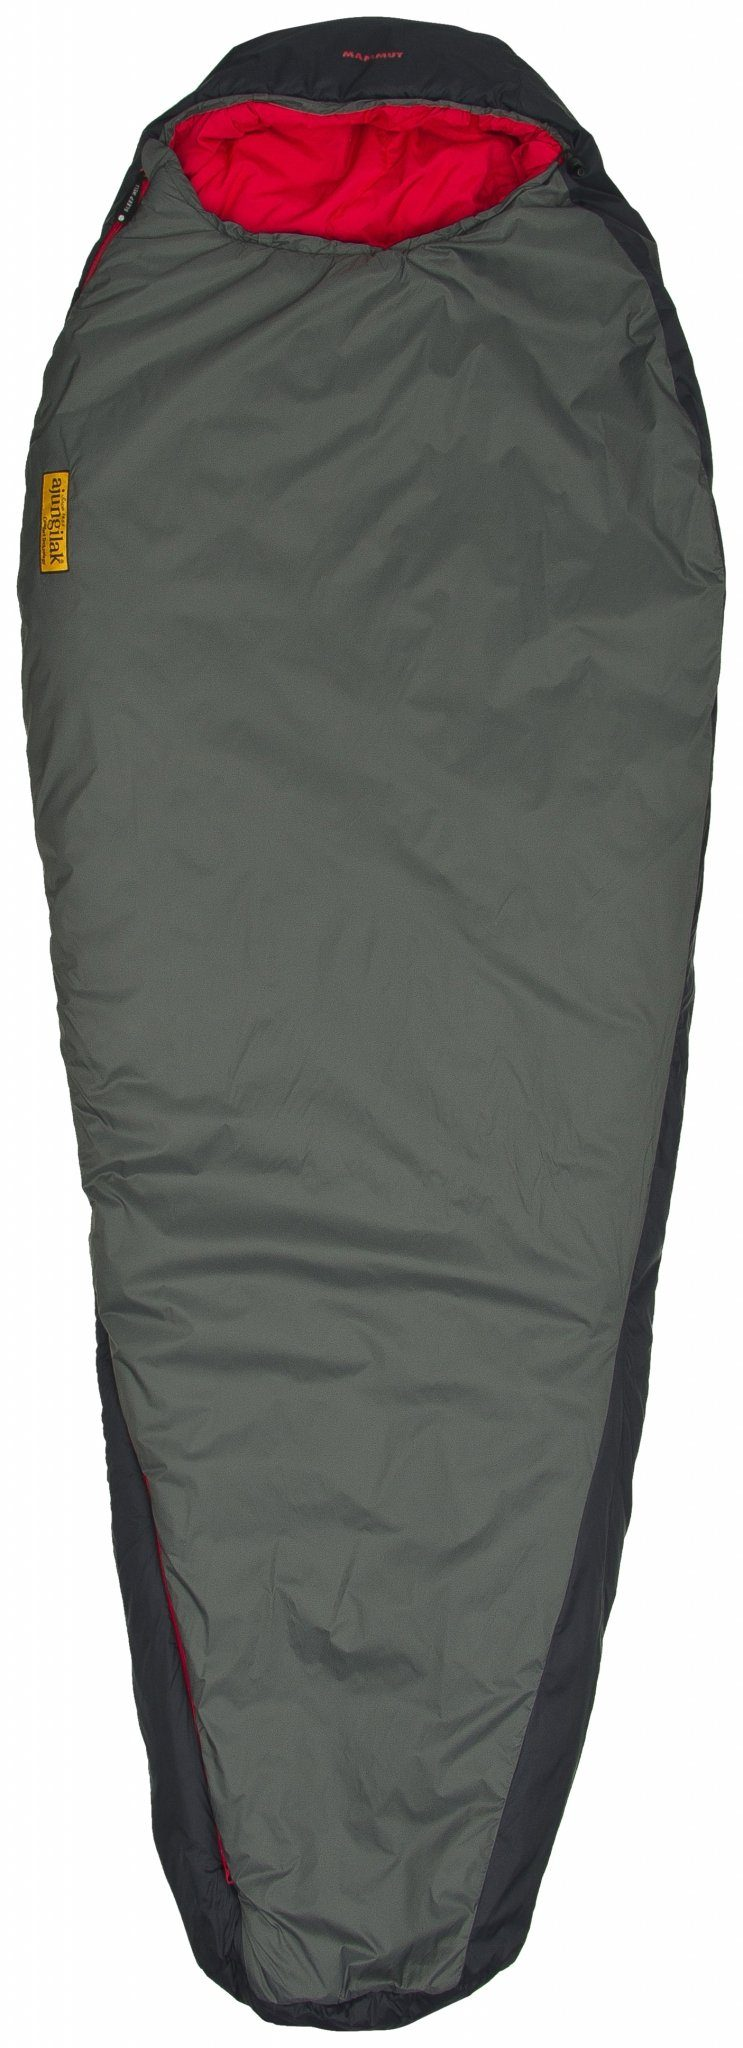 Mammut Schlafsack »Kompakt 3-Season 180 Sleeping Bag«